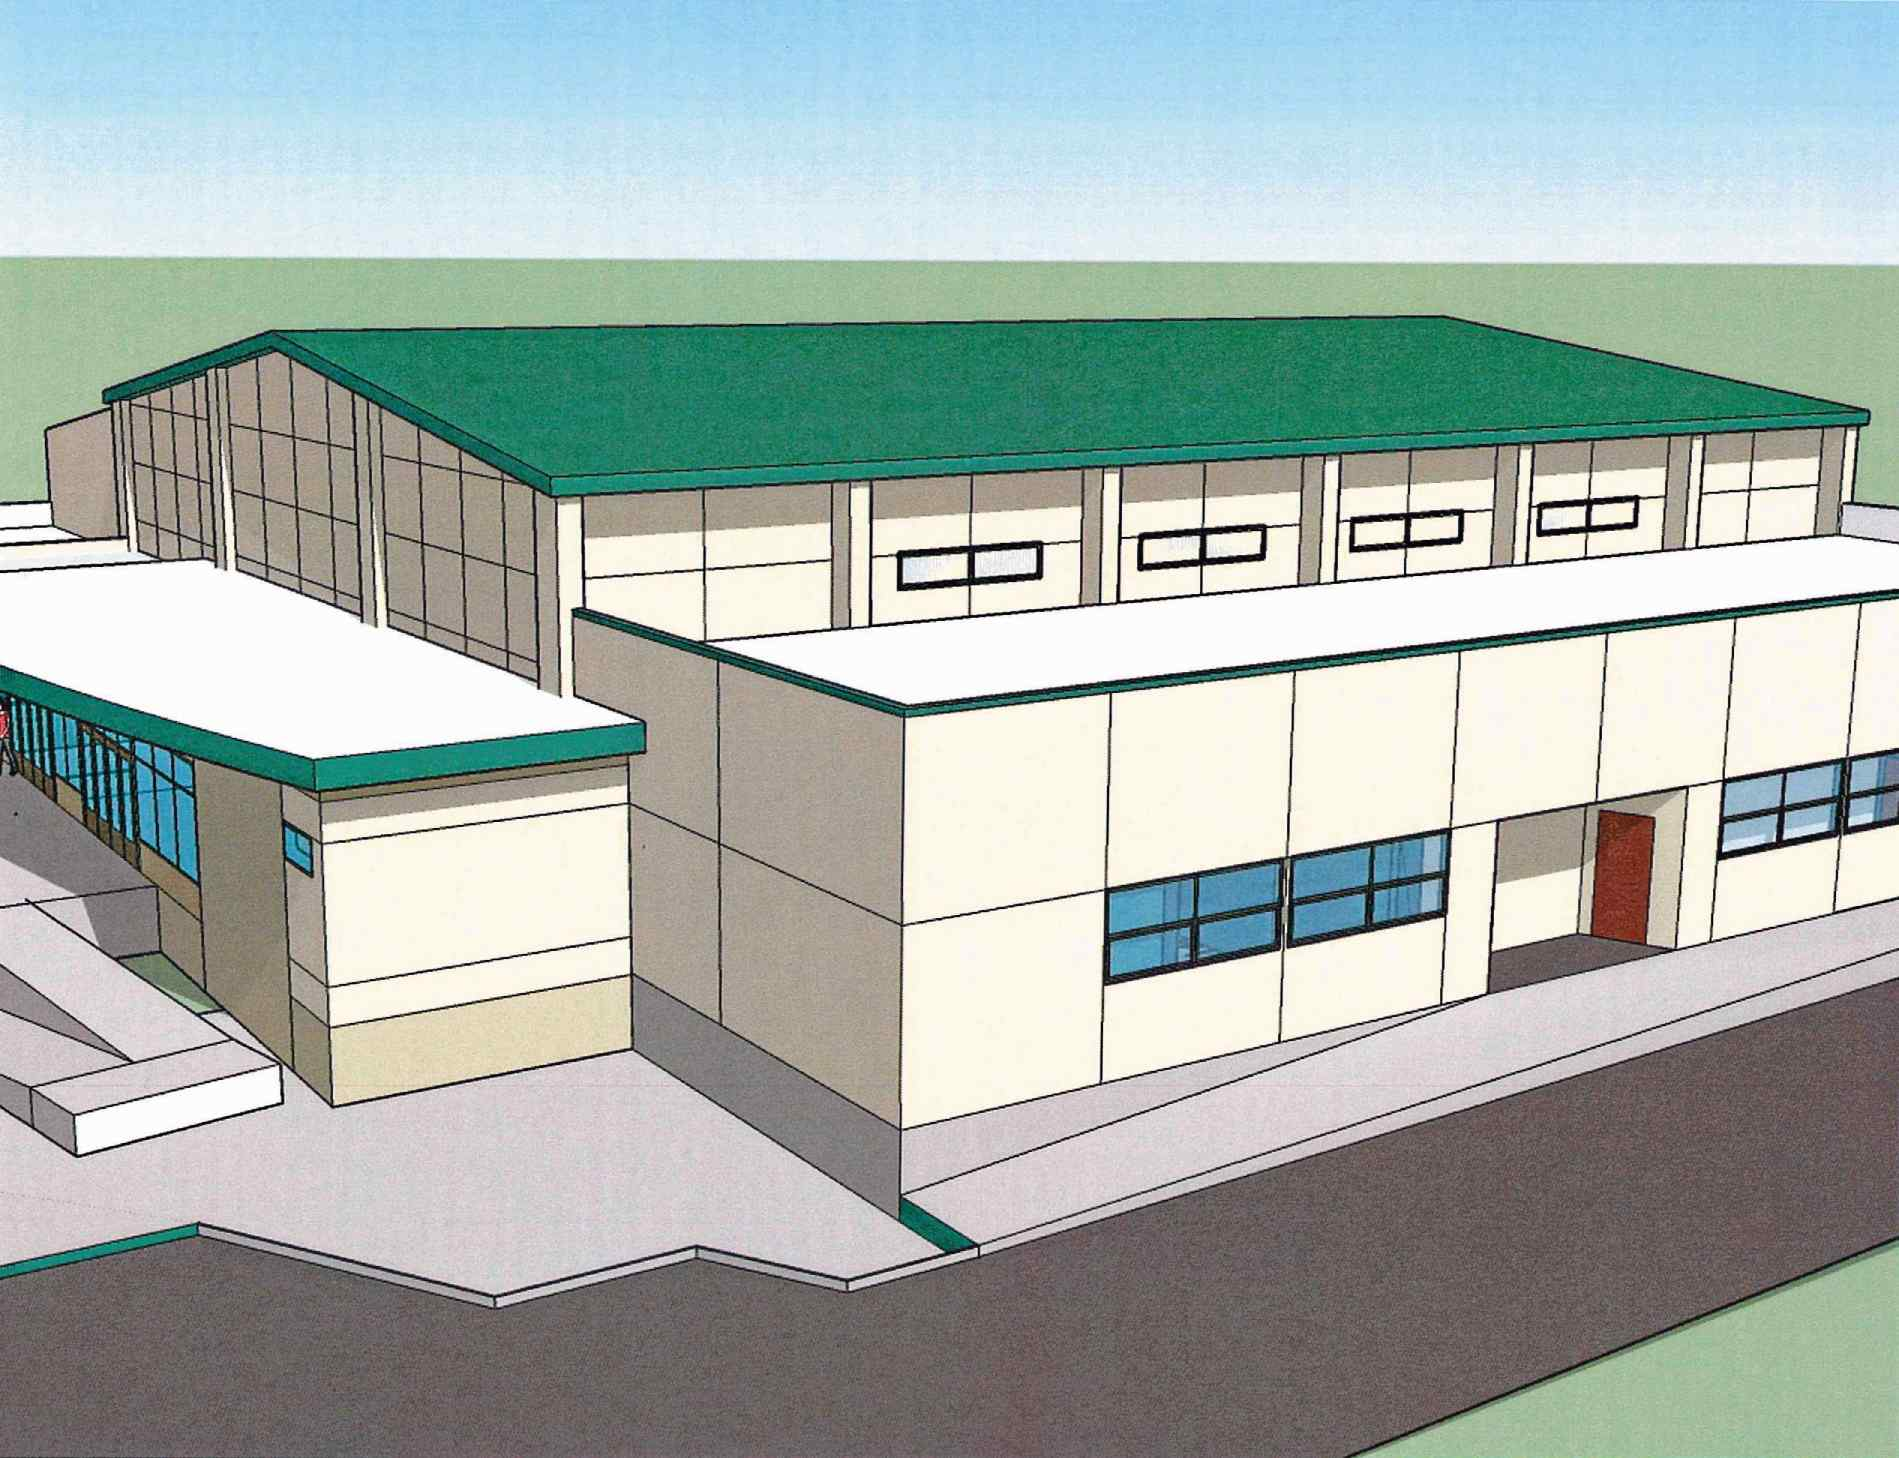 1899x1458 Design For South Fork Gym Improvements Chosen